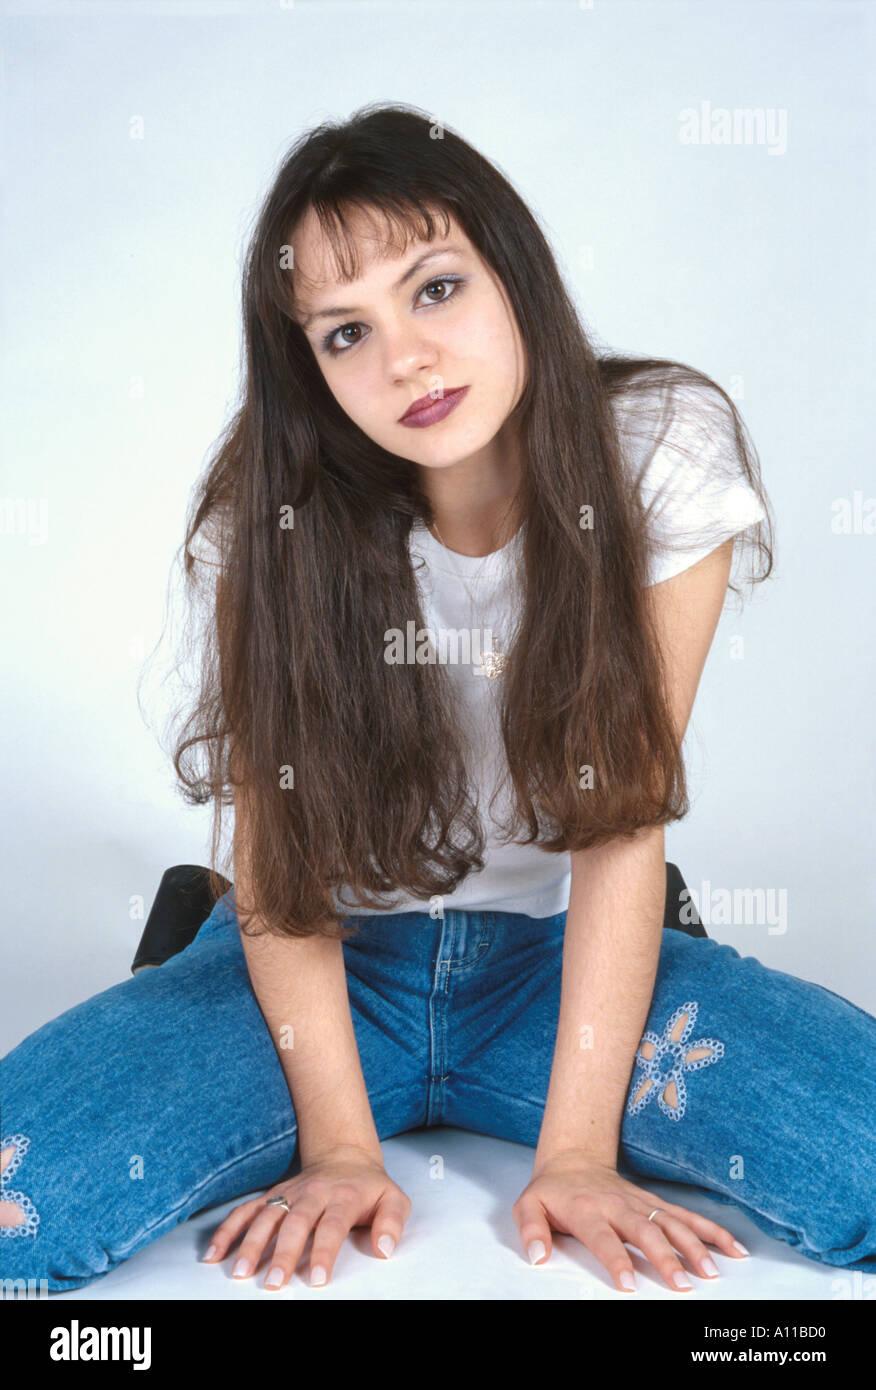 Marilyn Ball Teen Model Stock Photo: 72662 - Alamy